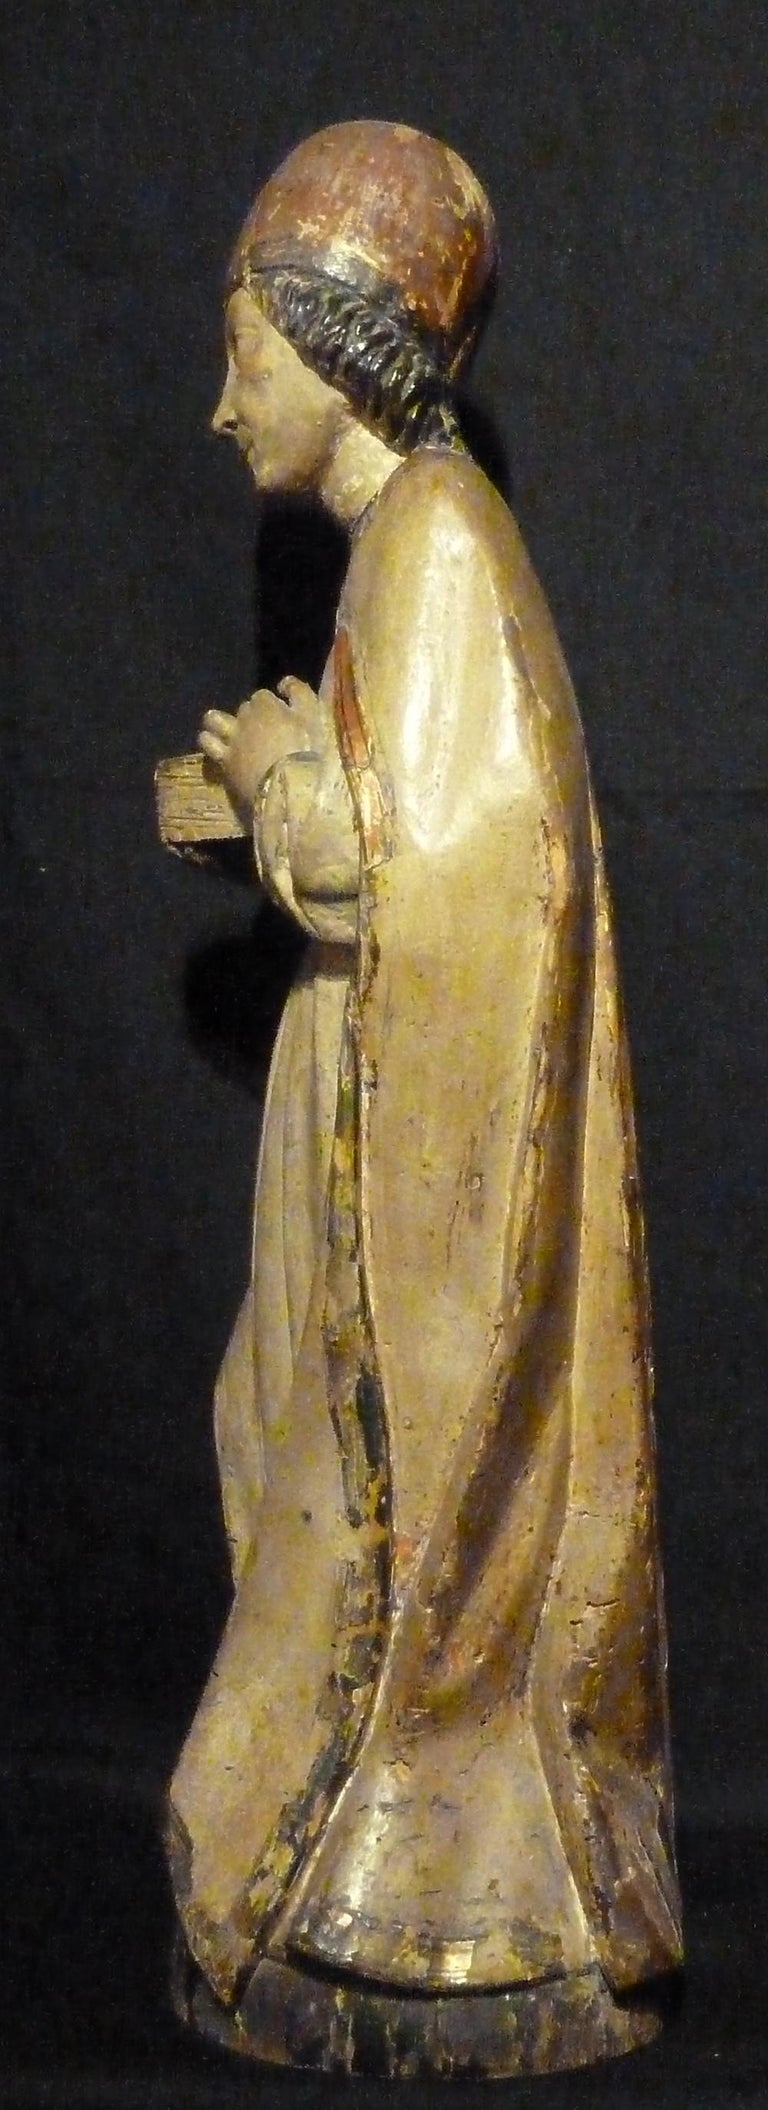 Renaissance Sculpture in Polychrome Wood, Depicting Bishop For Sale